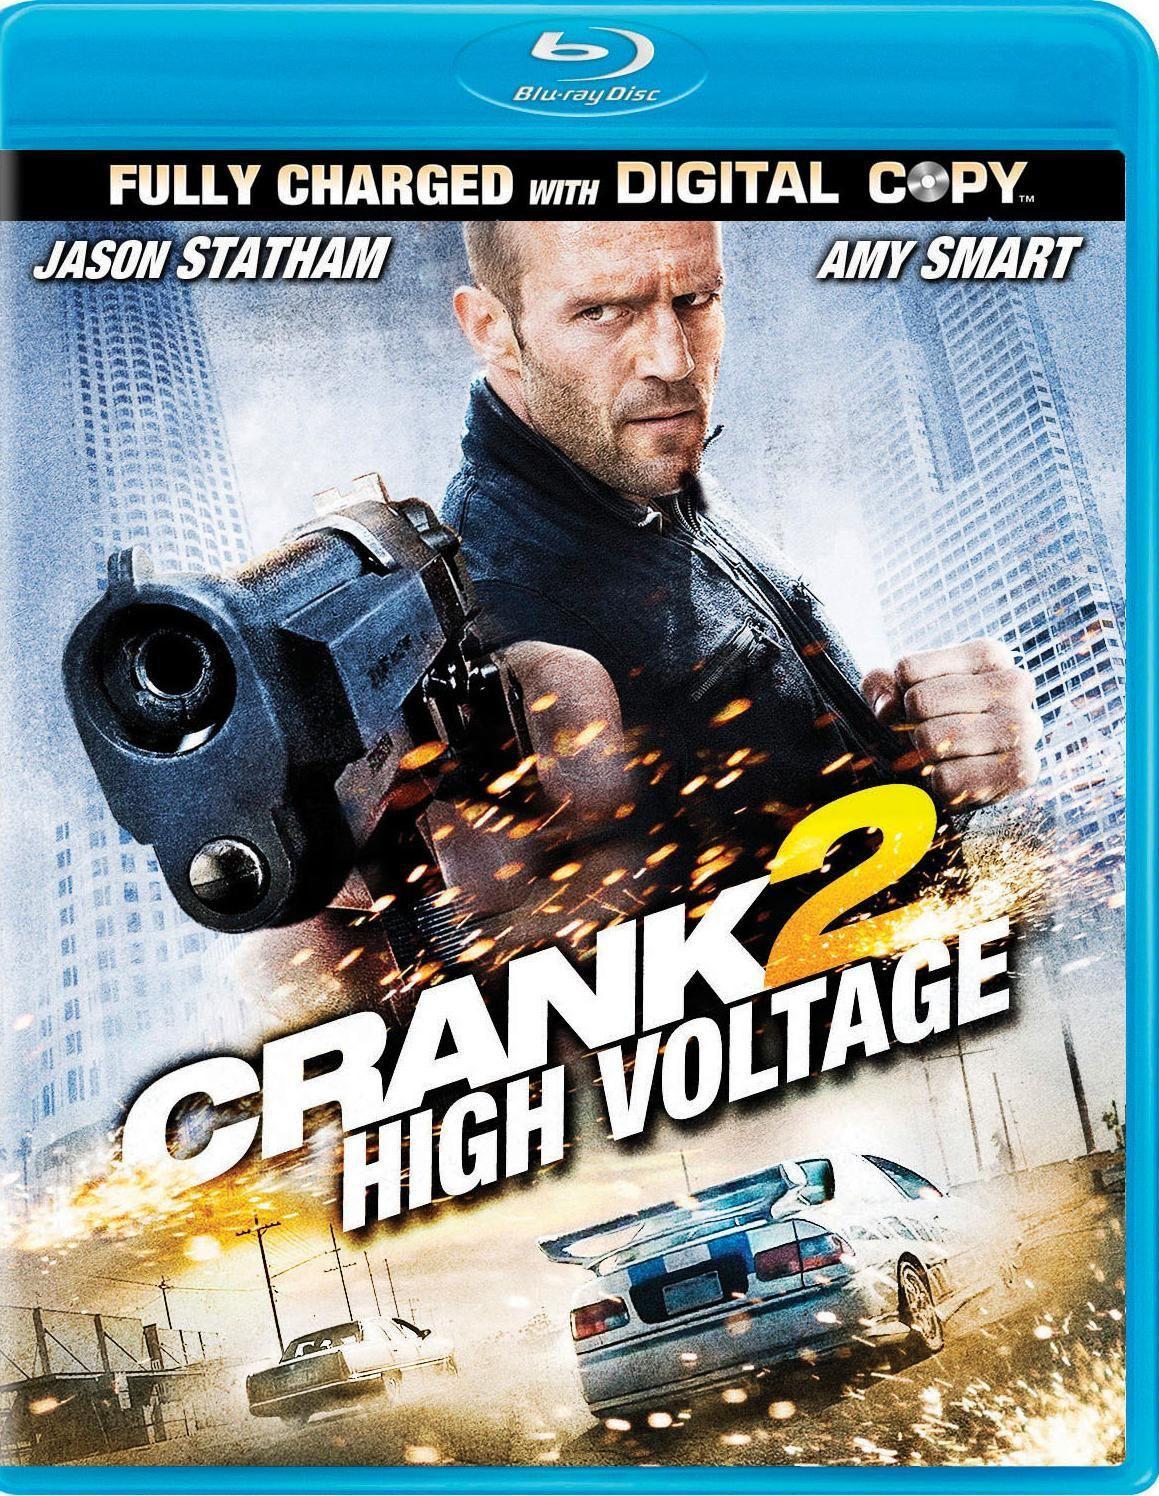 Crank 2 high voltage sexscene